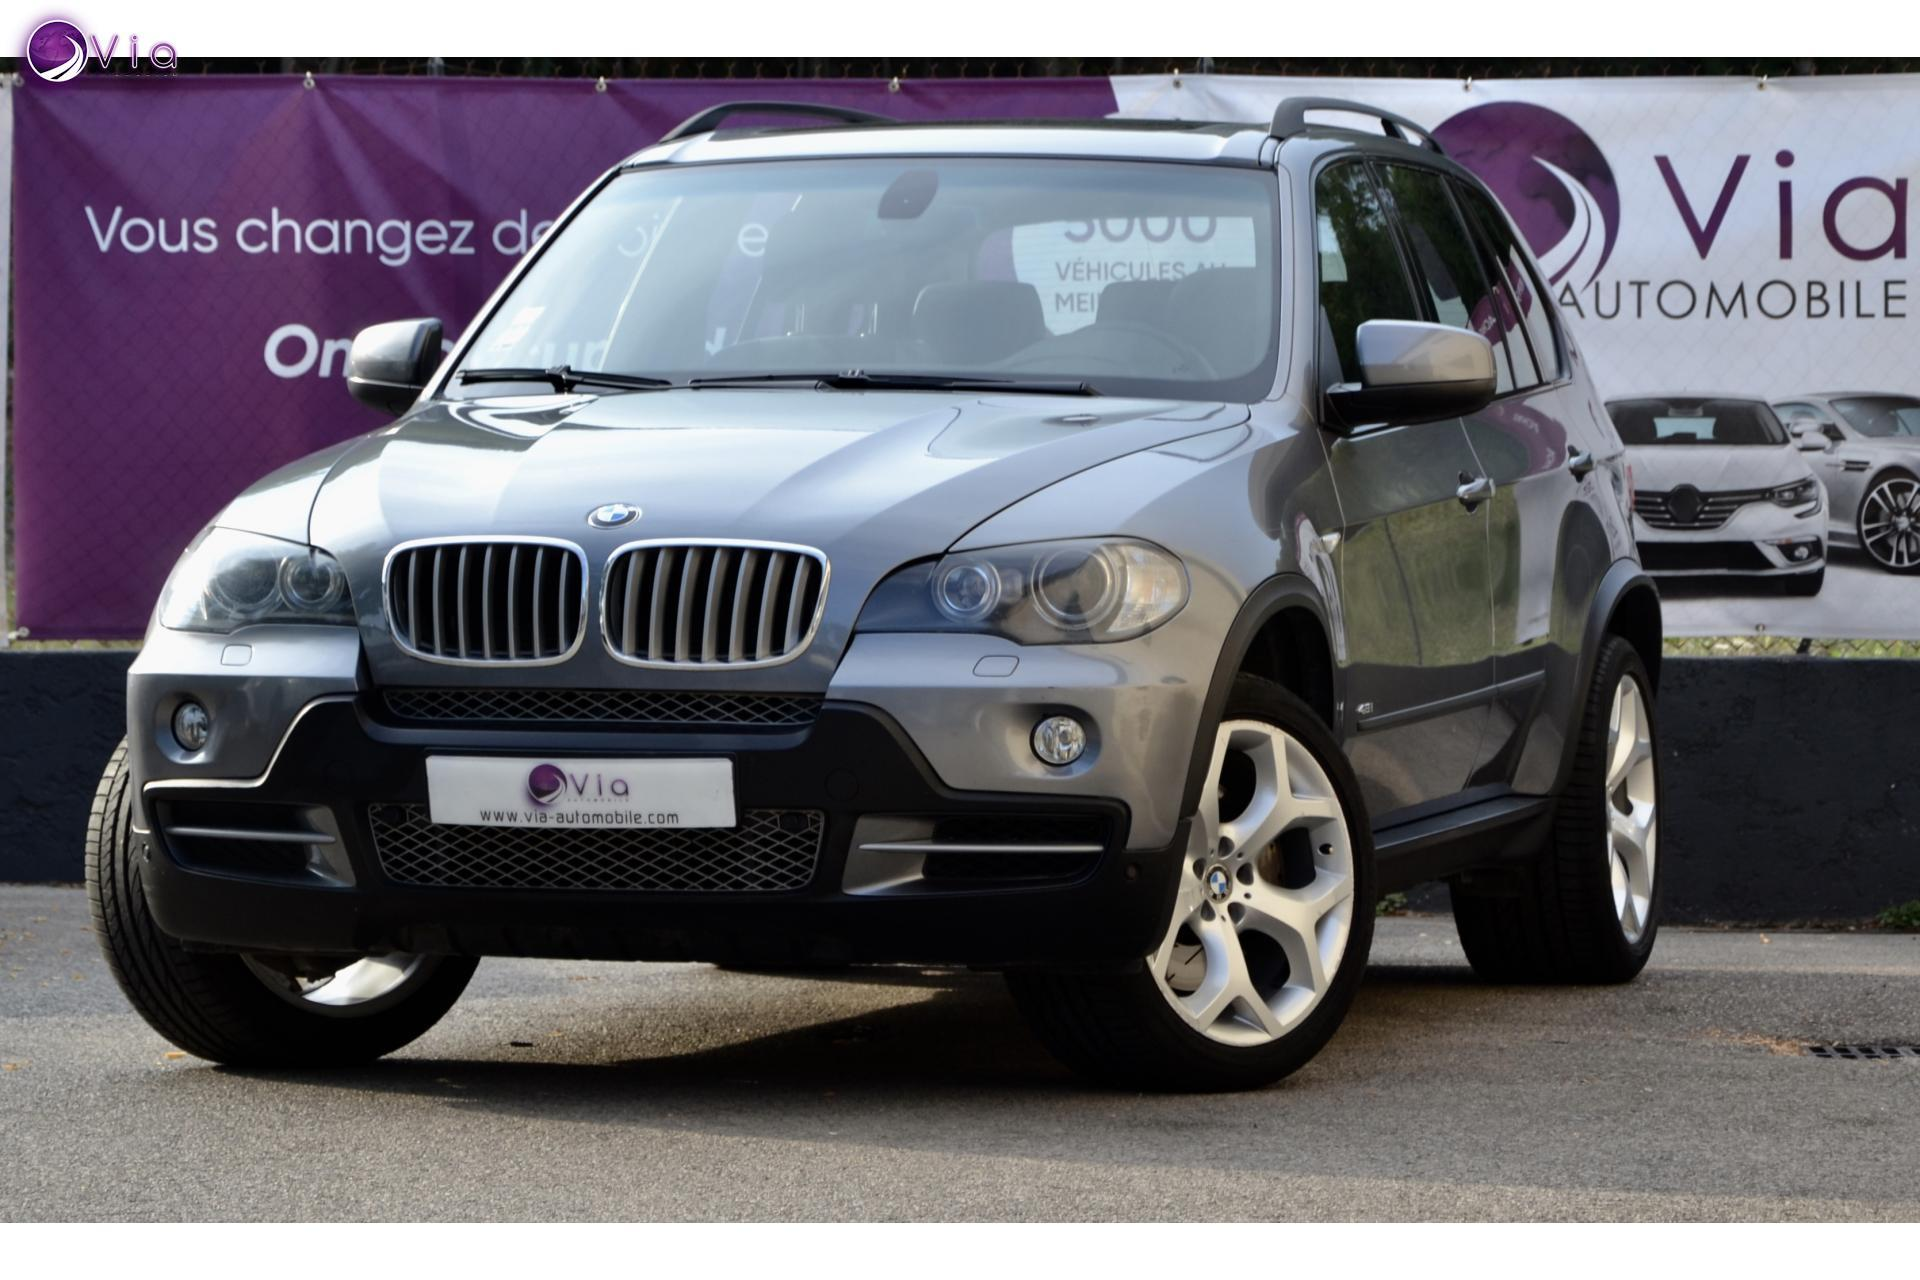 BMW-X5-4.8 I 355 LUXE XDRIVE BVA